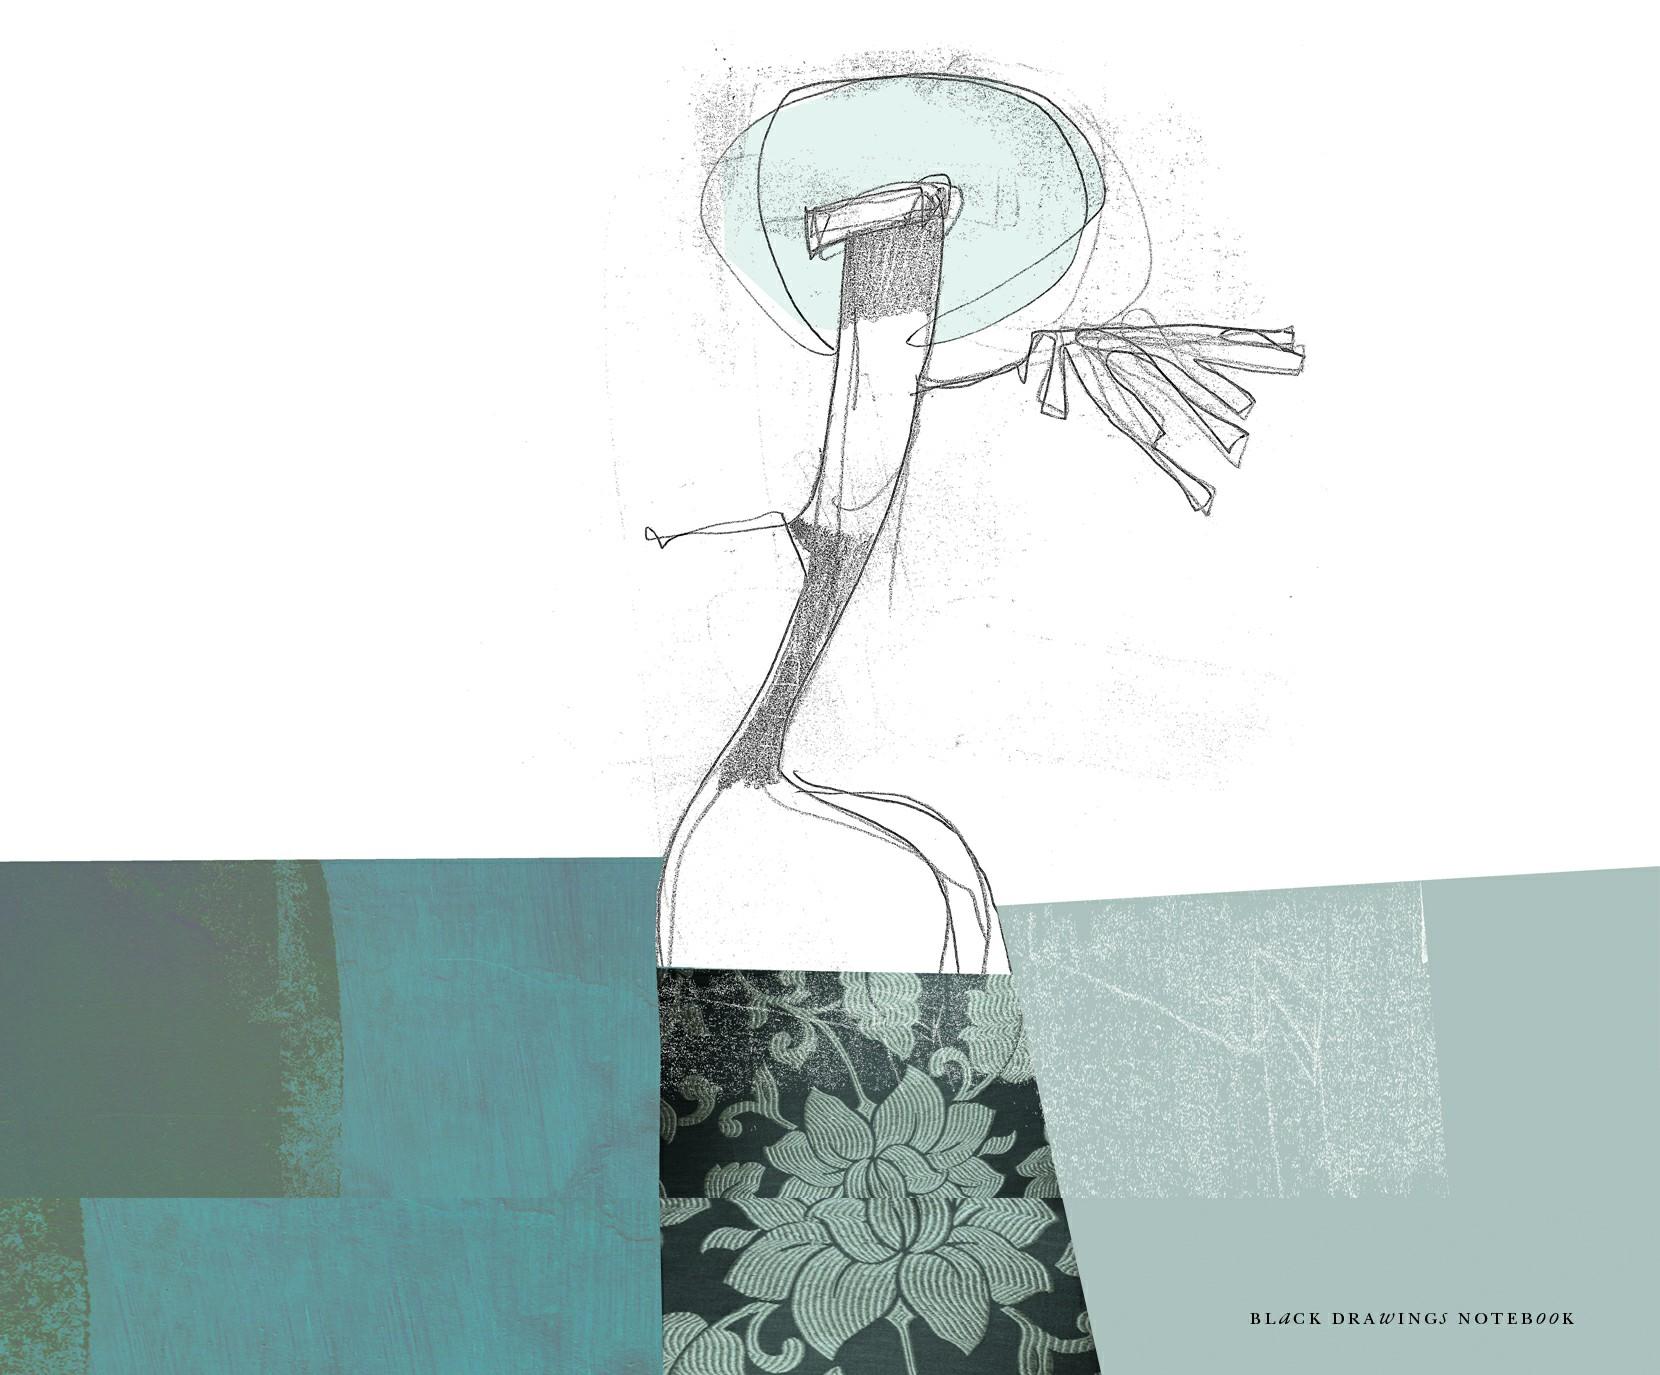 silvio-cocco-drawings-illustration-02